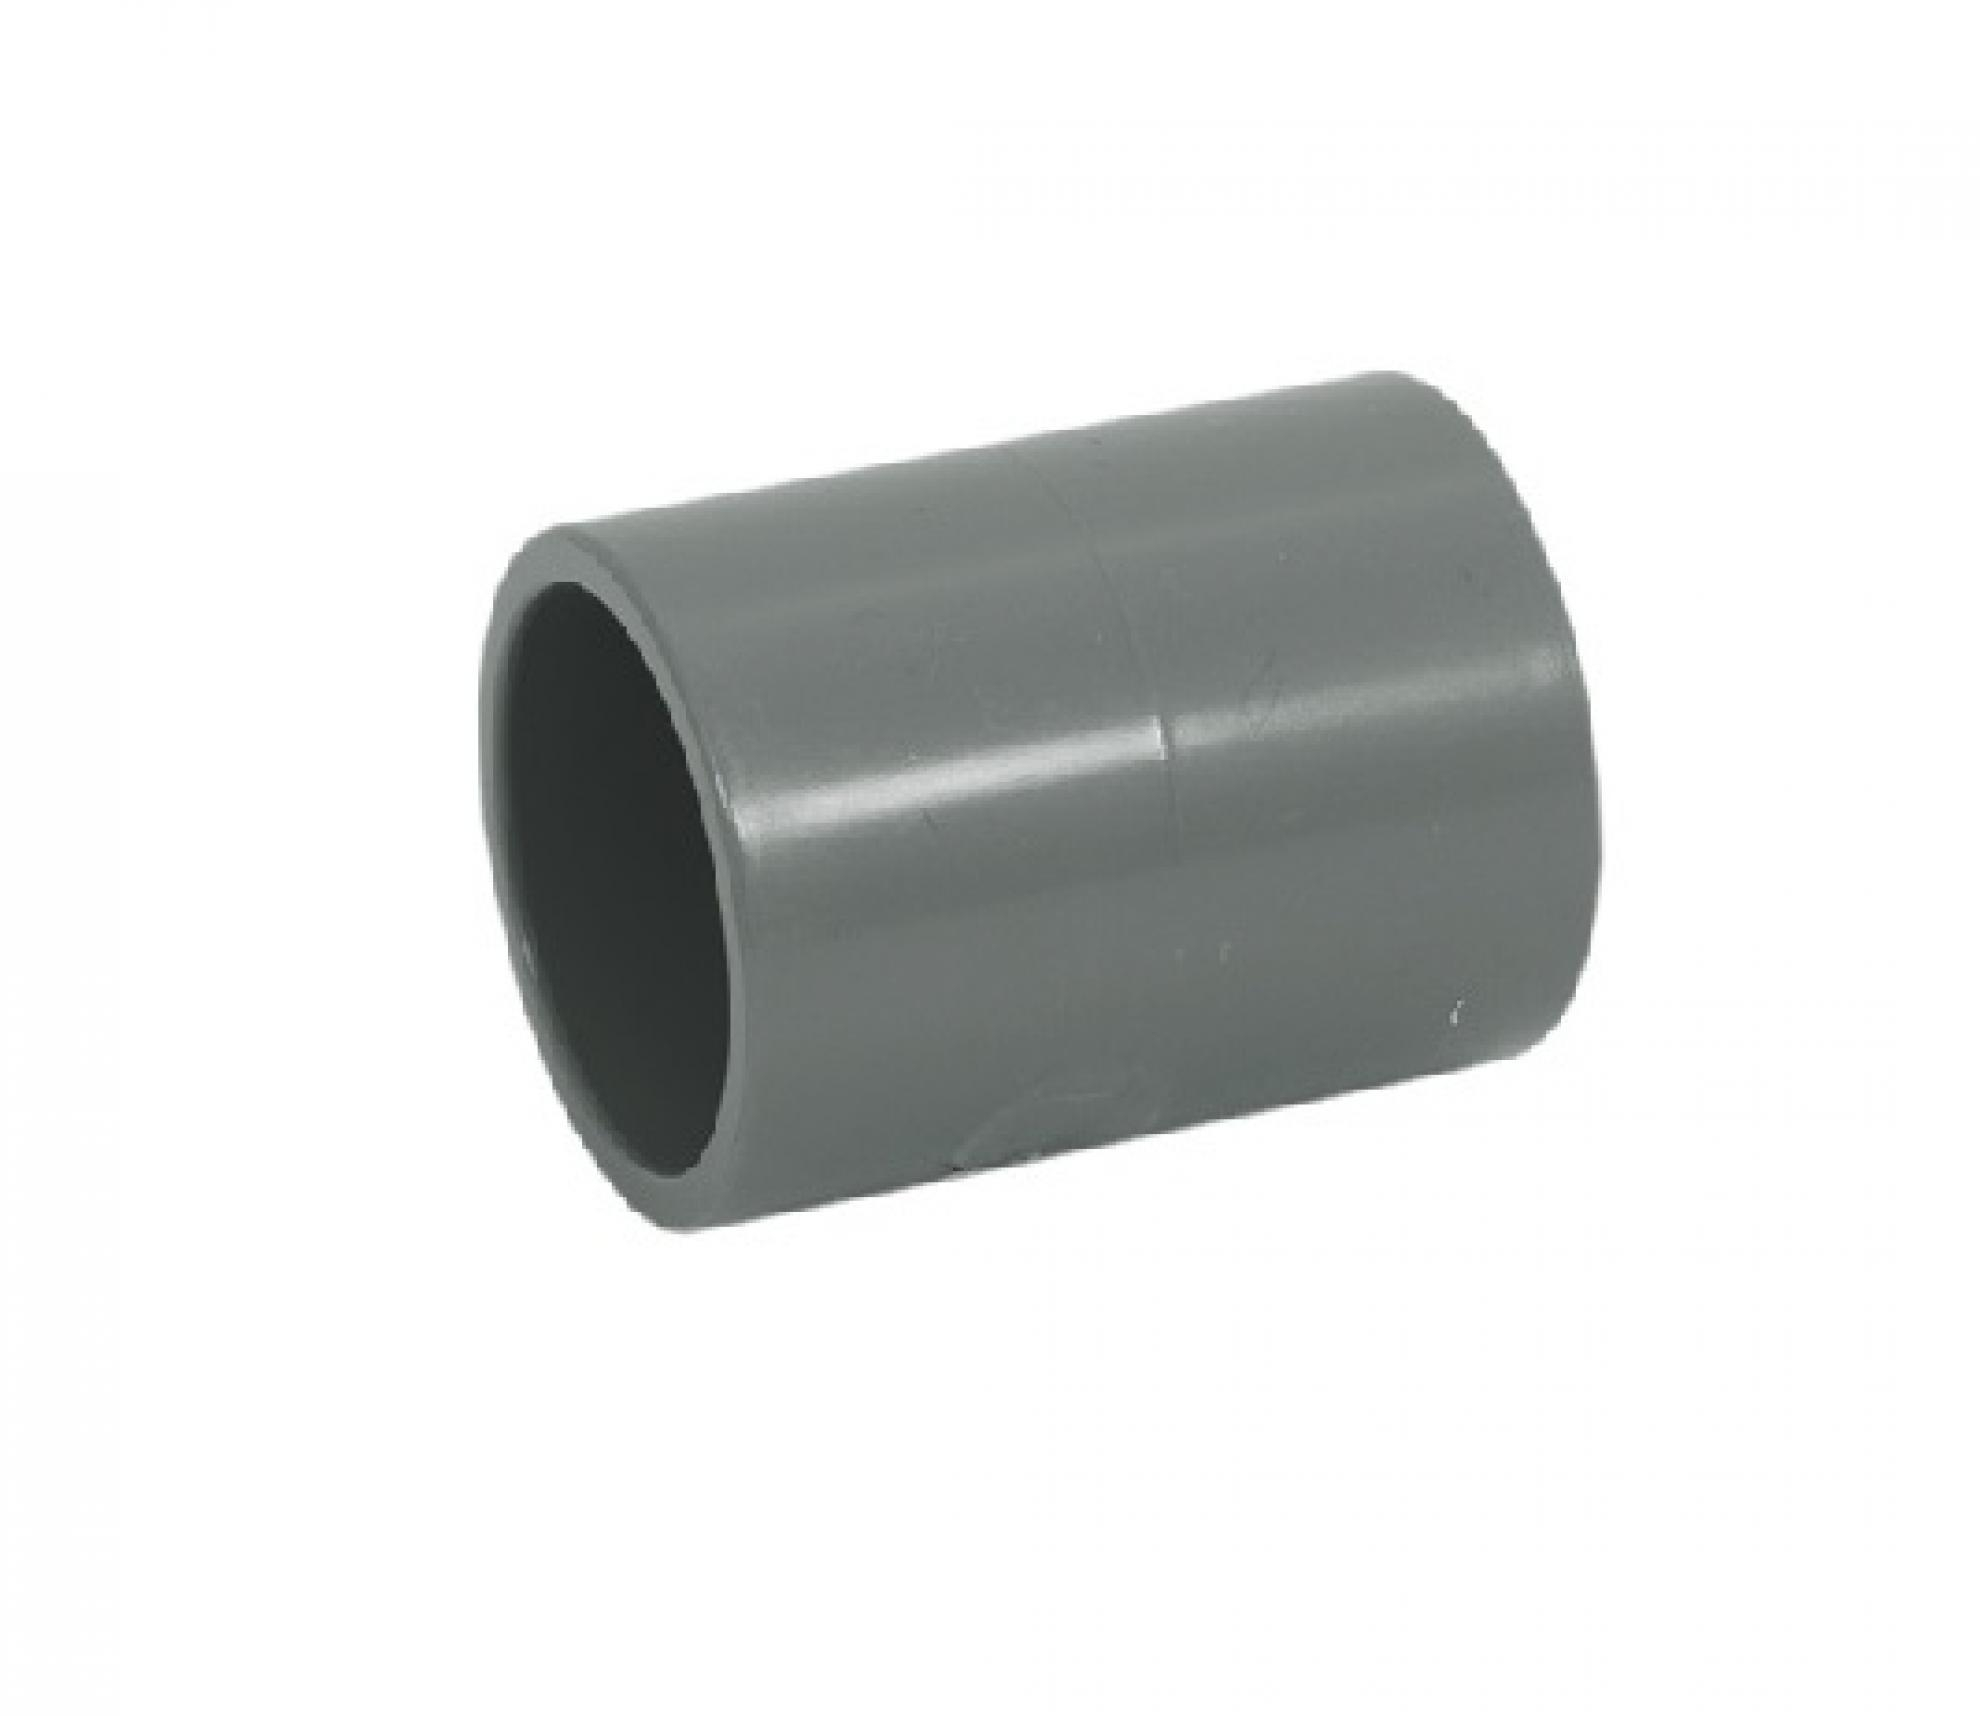 "Luva PVC 1/2"" polegada encaixe - Cinza"